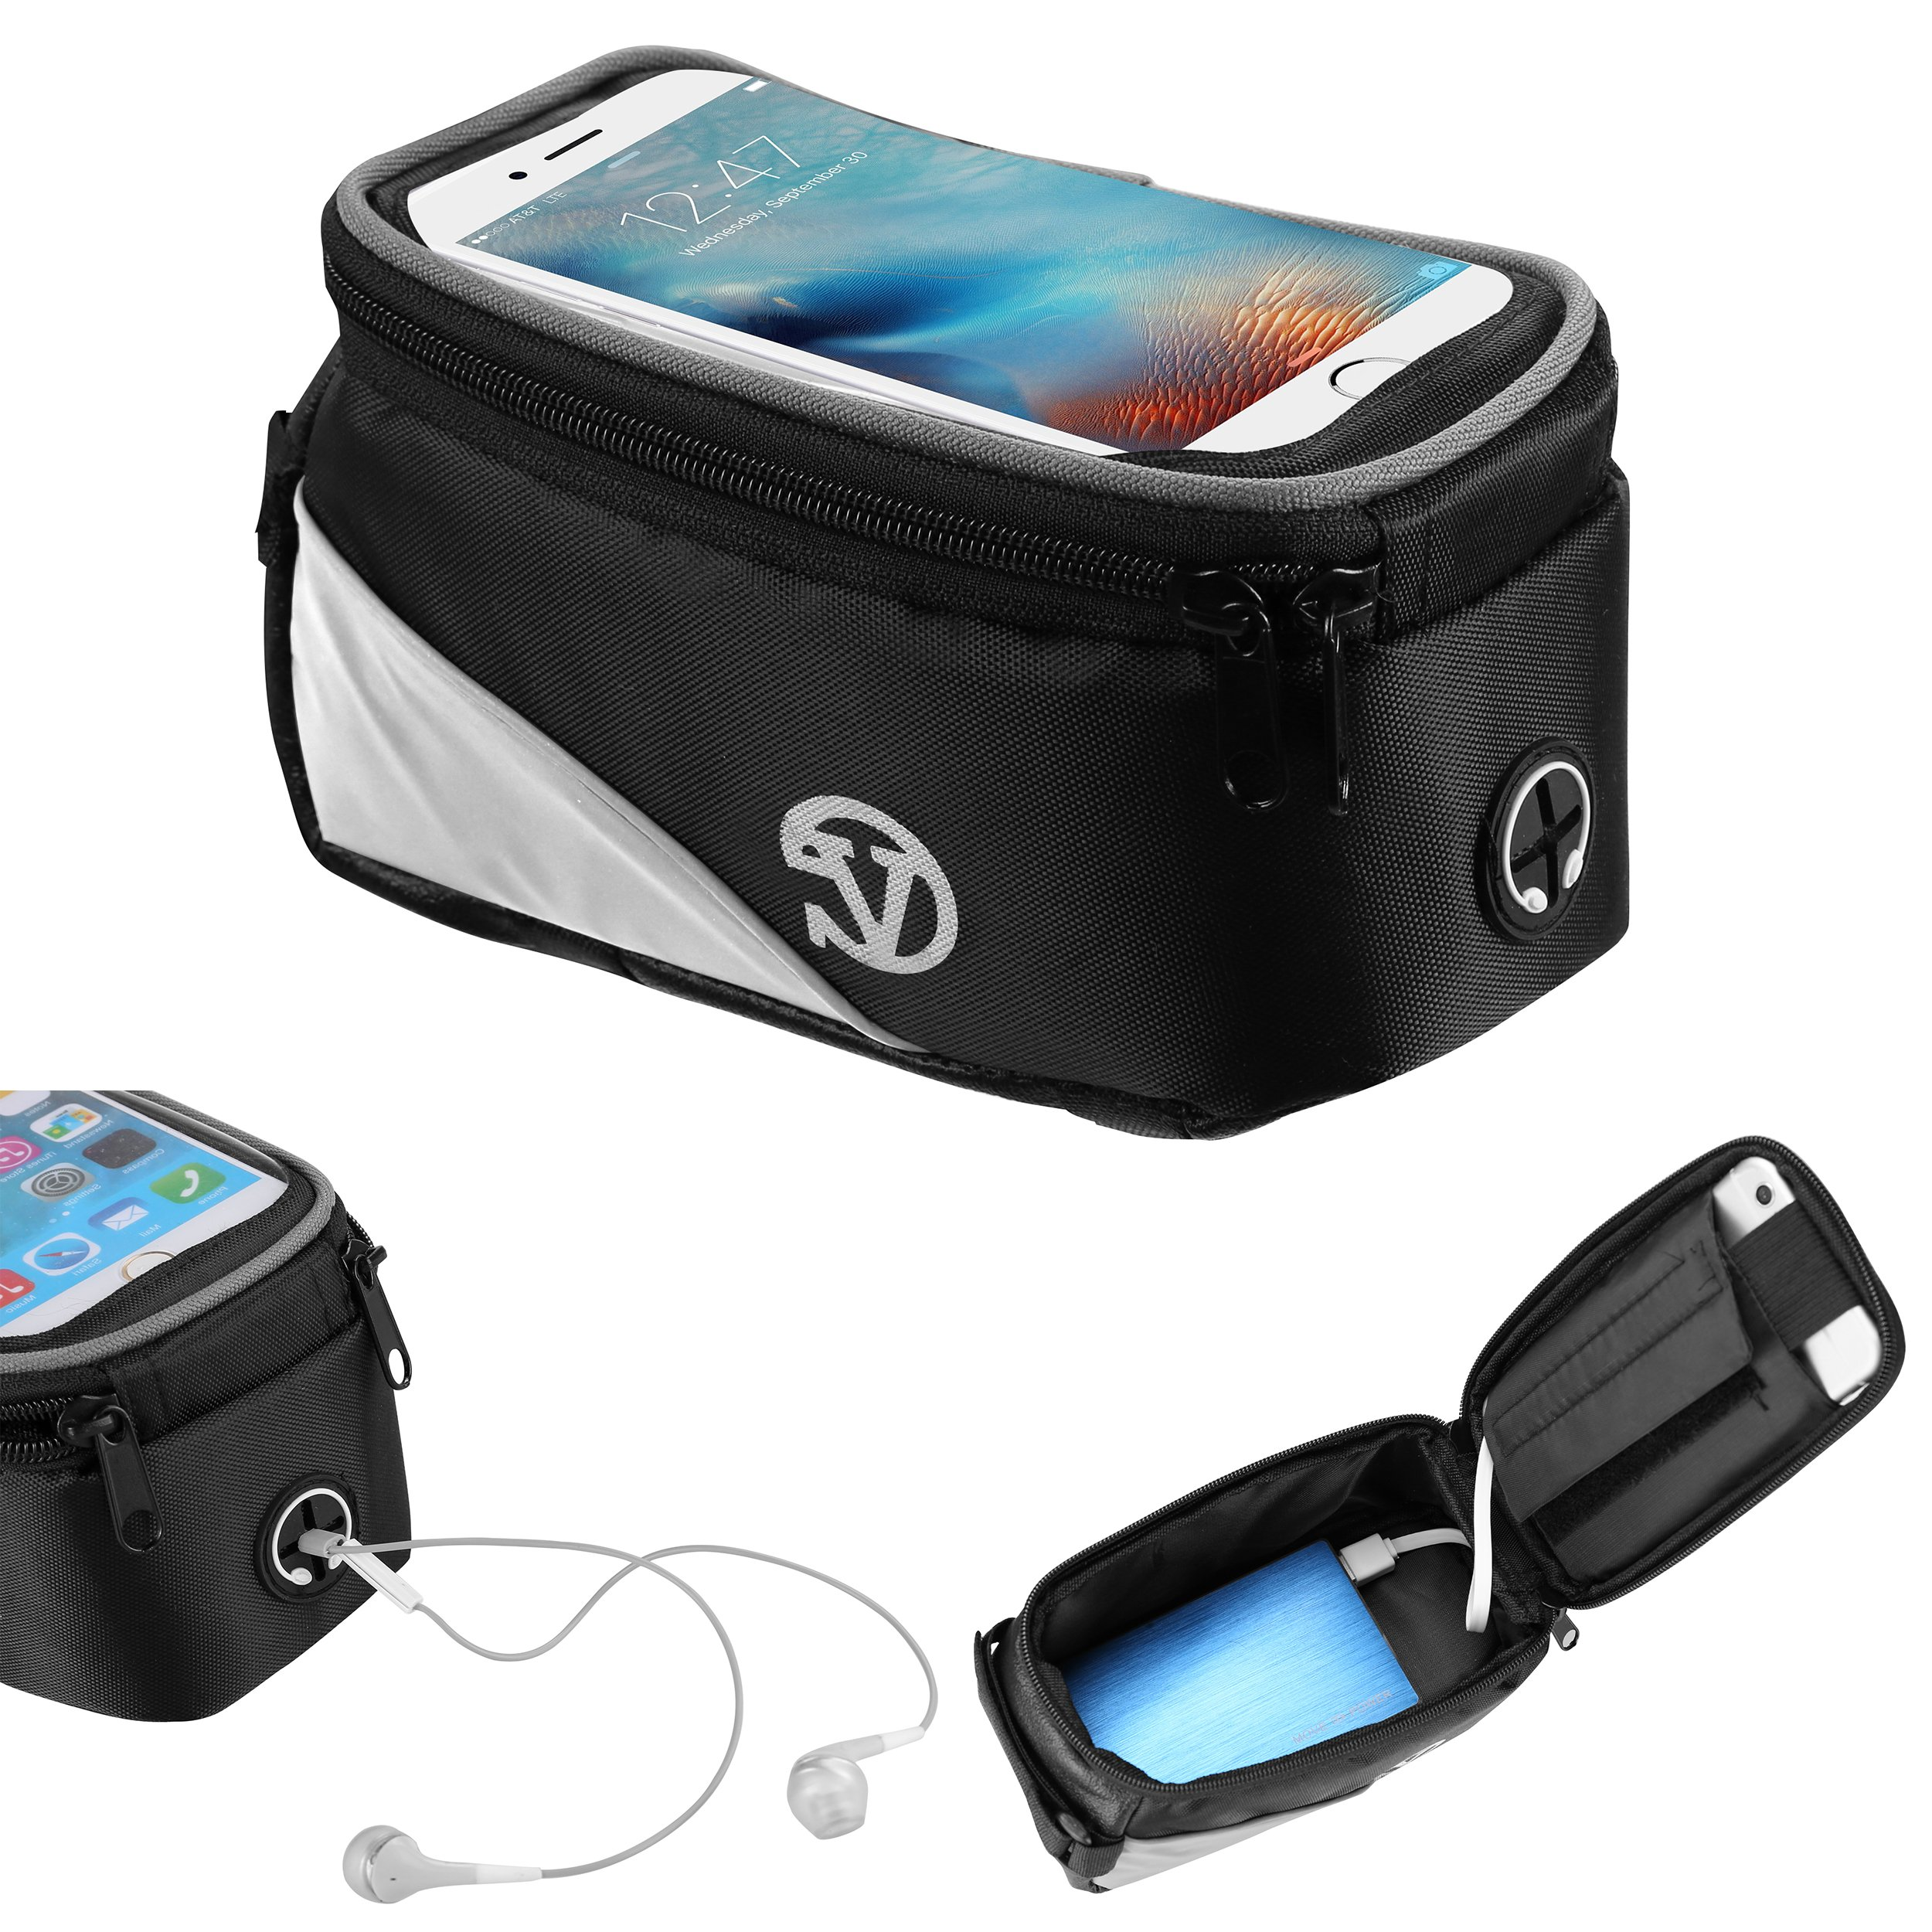 Vangoddy Outdoor Cycling Bag Cellphone Pouch Bike Bag Frame Bag for LG V35/Q7/K30/V30S ThinQ/Zone 4/Aristo 2/Tribute Dynasty/Signature Edition/LS7 4G LTE/K7i Mosquito Away/V30+/V30/Q8/Q6/K7 2017/G6+